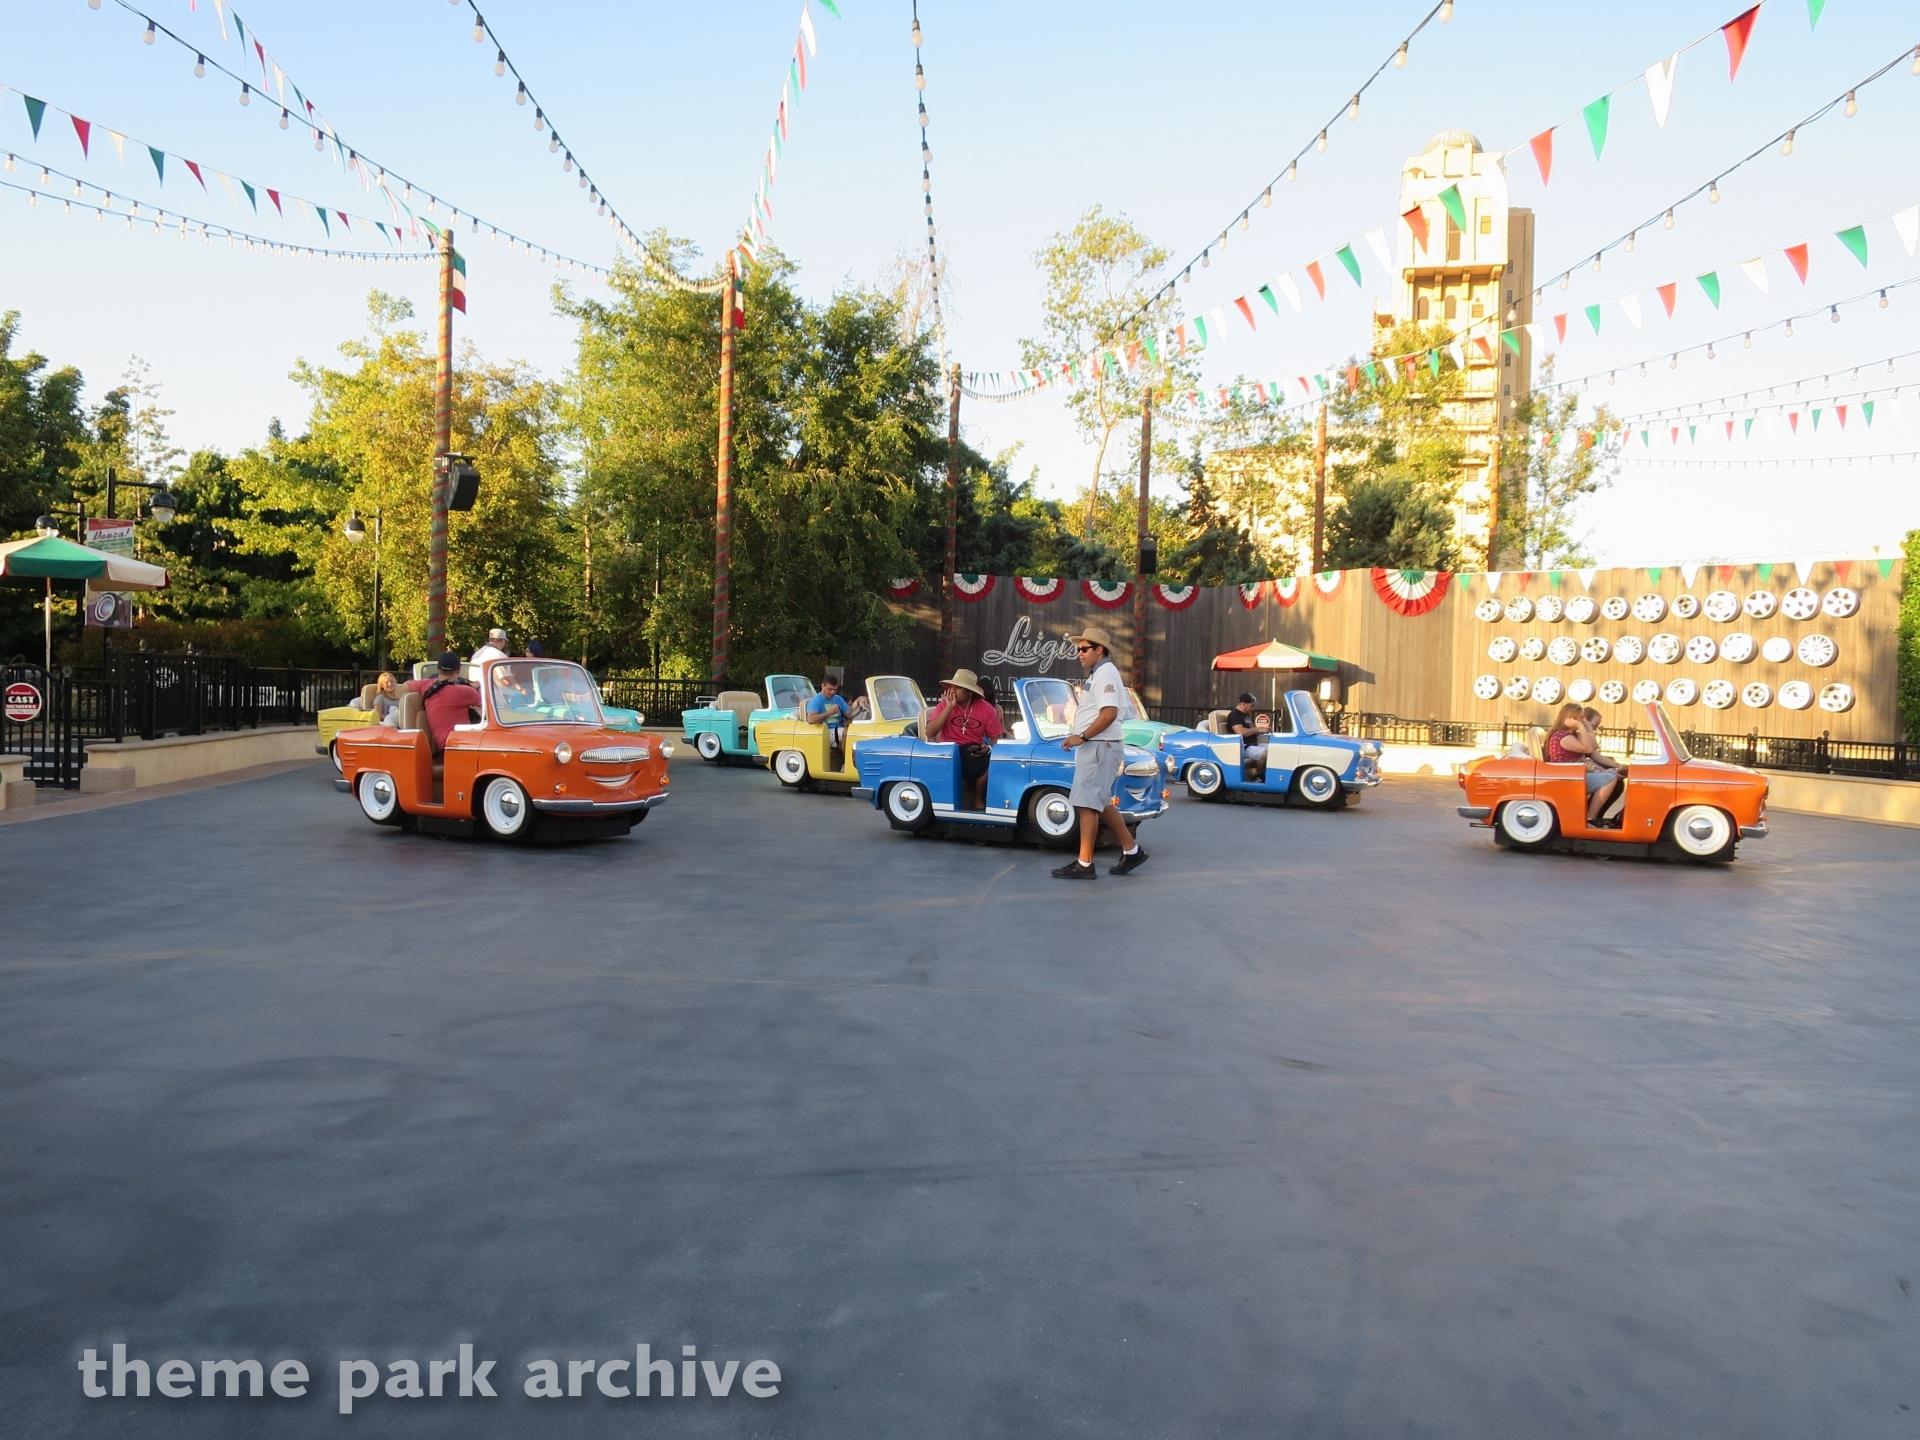 Luigi's Rollicking Roadsters at Disney California Adventure